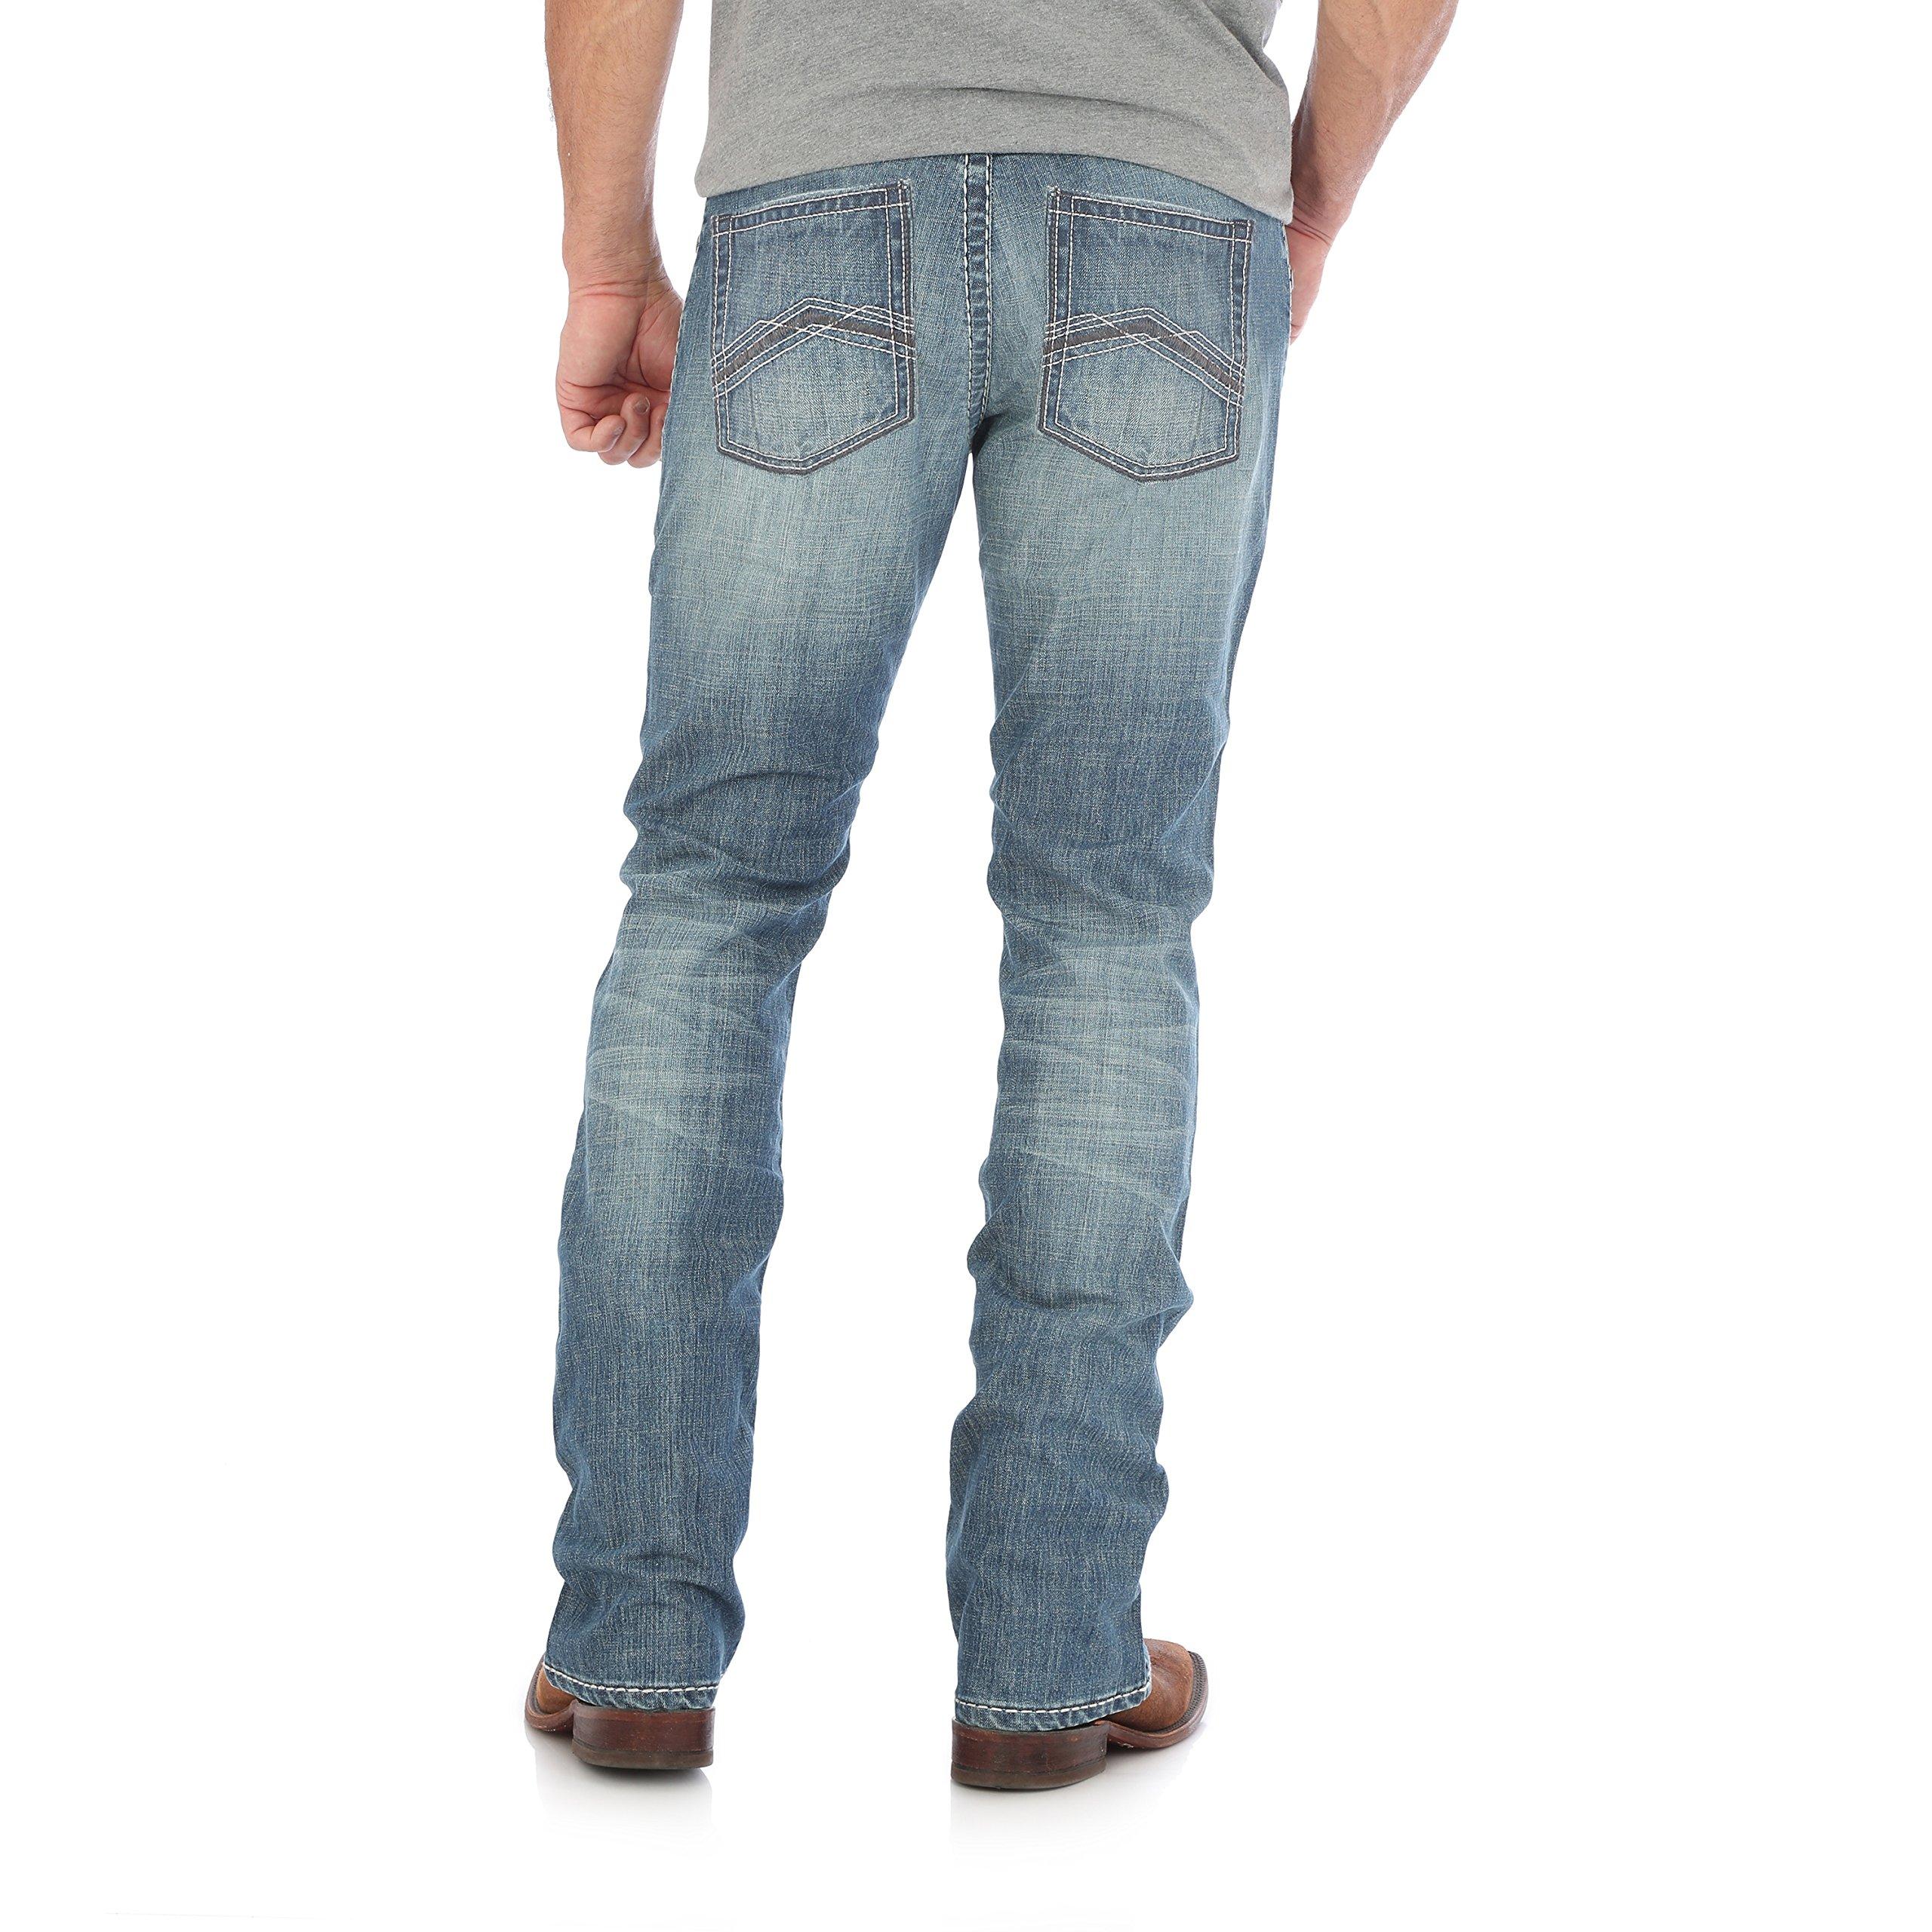 Wrangler Men's 20x Slim Fit Straight Leg Jean